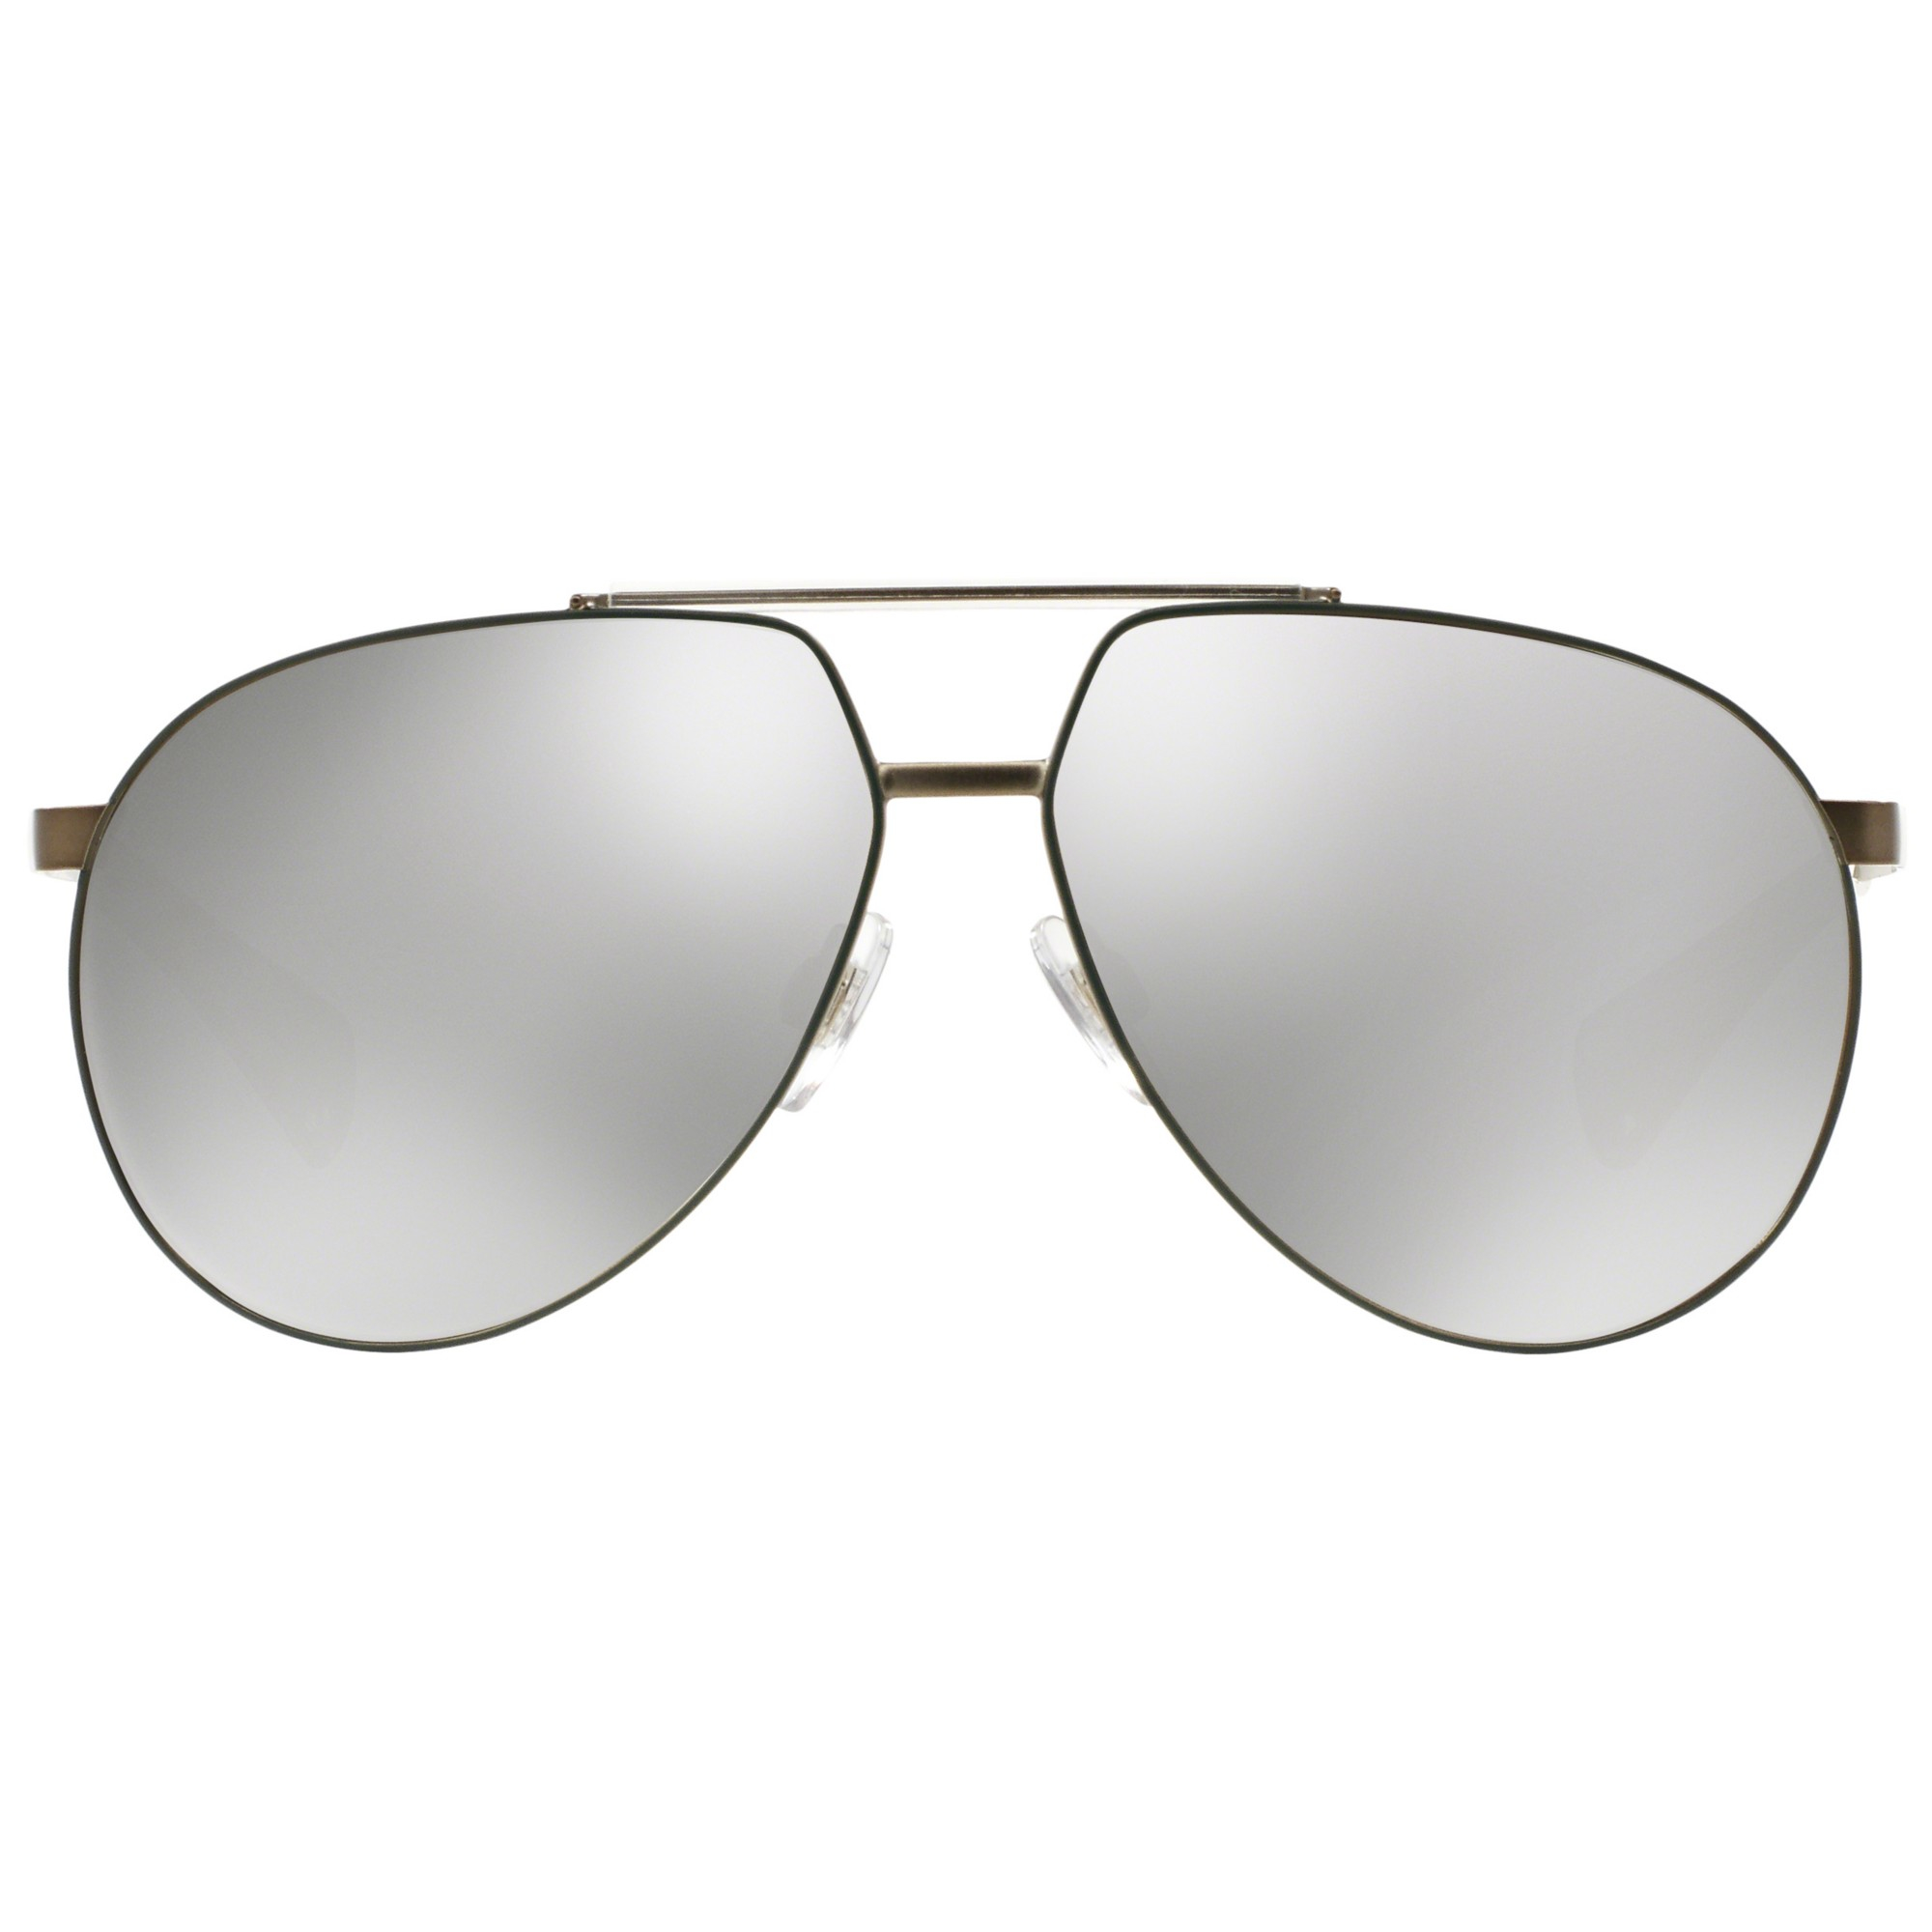 fe7d3fa560f3 Dolce   Gabbana Dg2152 Aviator Sunglasses in Metallic - Lyst